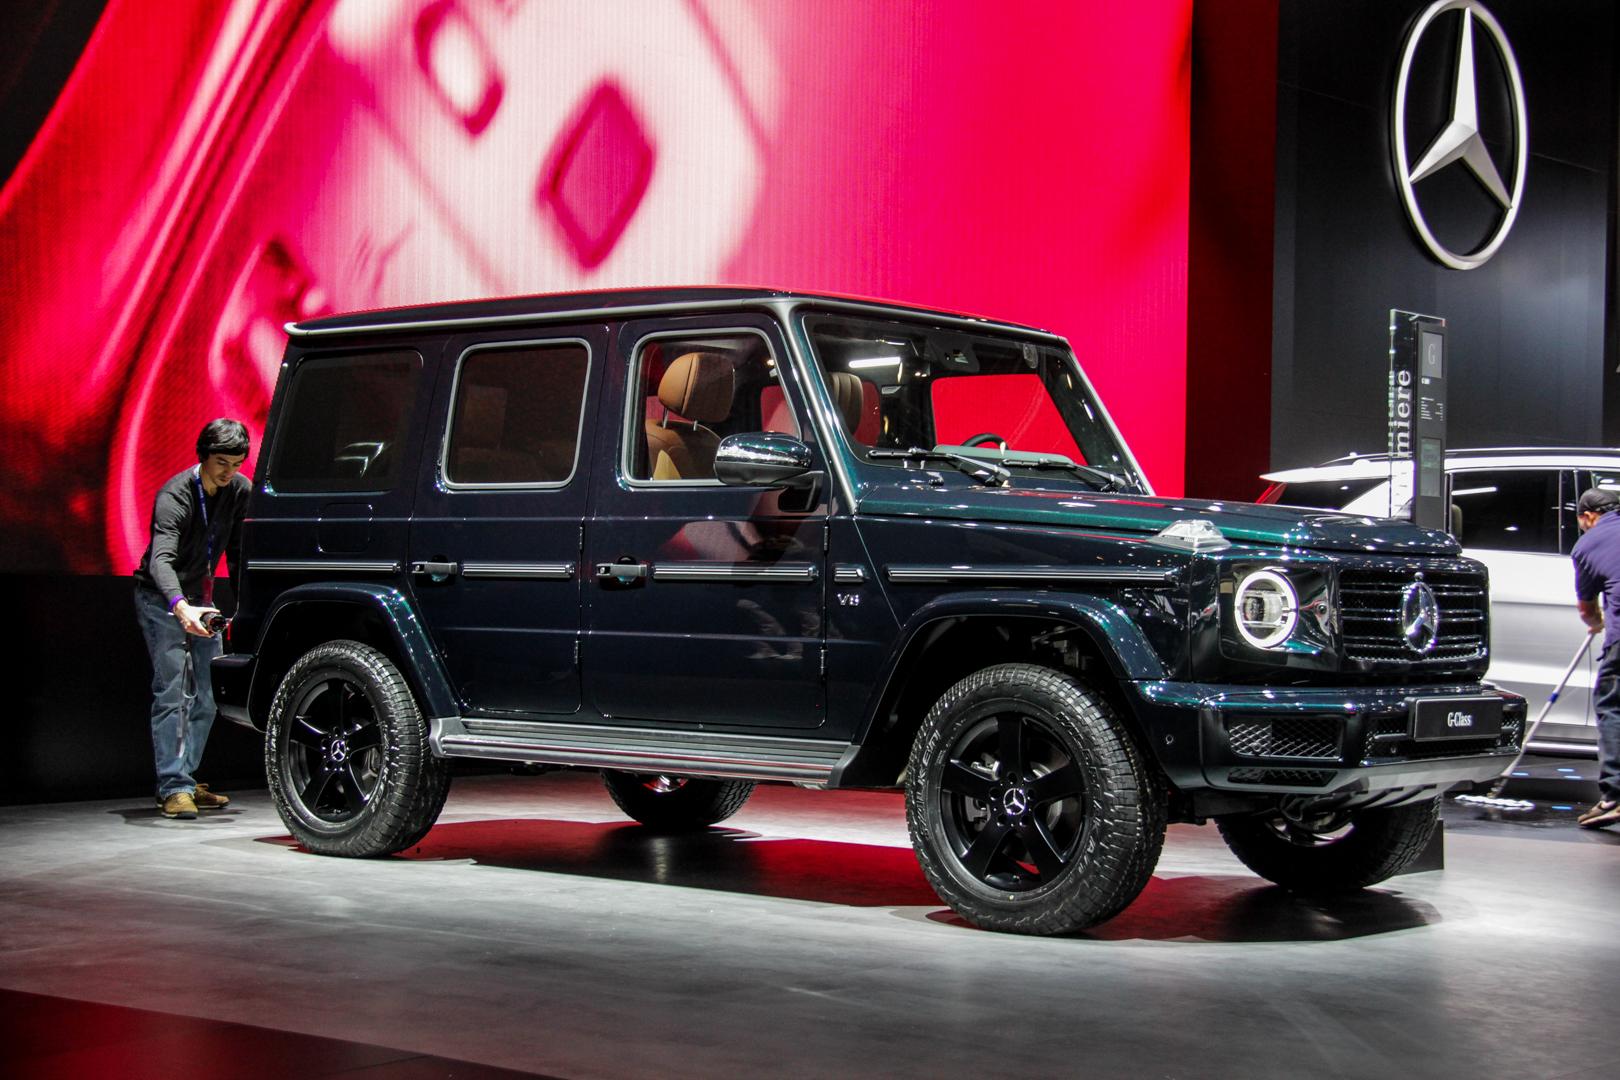 2018 Detroit Auto Show: The first new Mercedes-Benz G ...